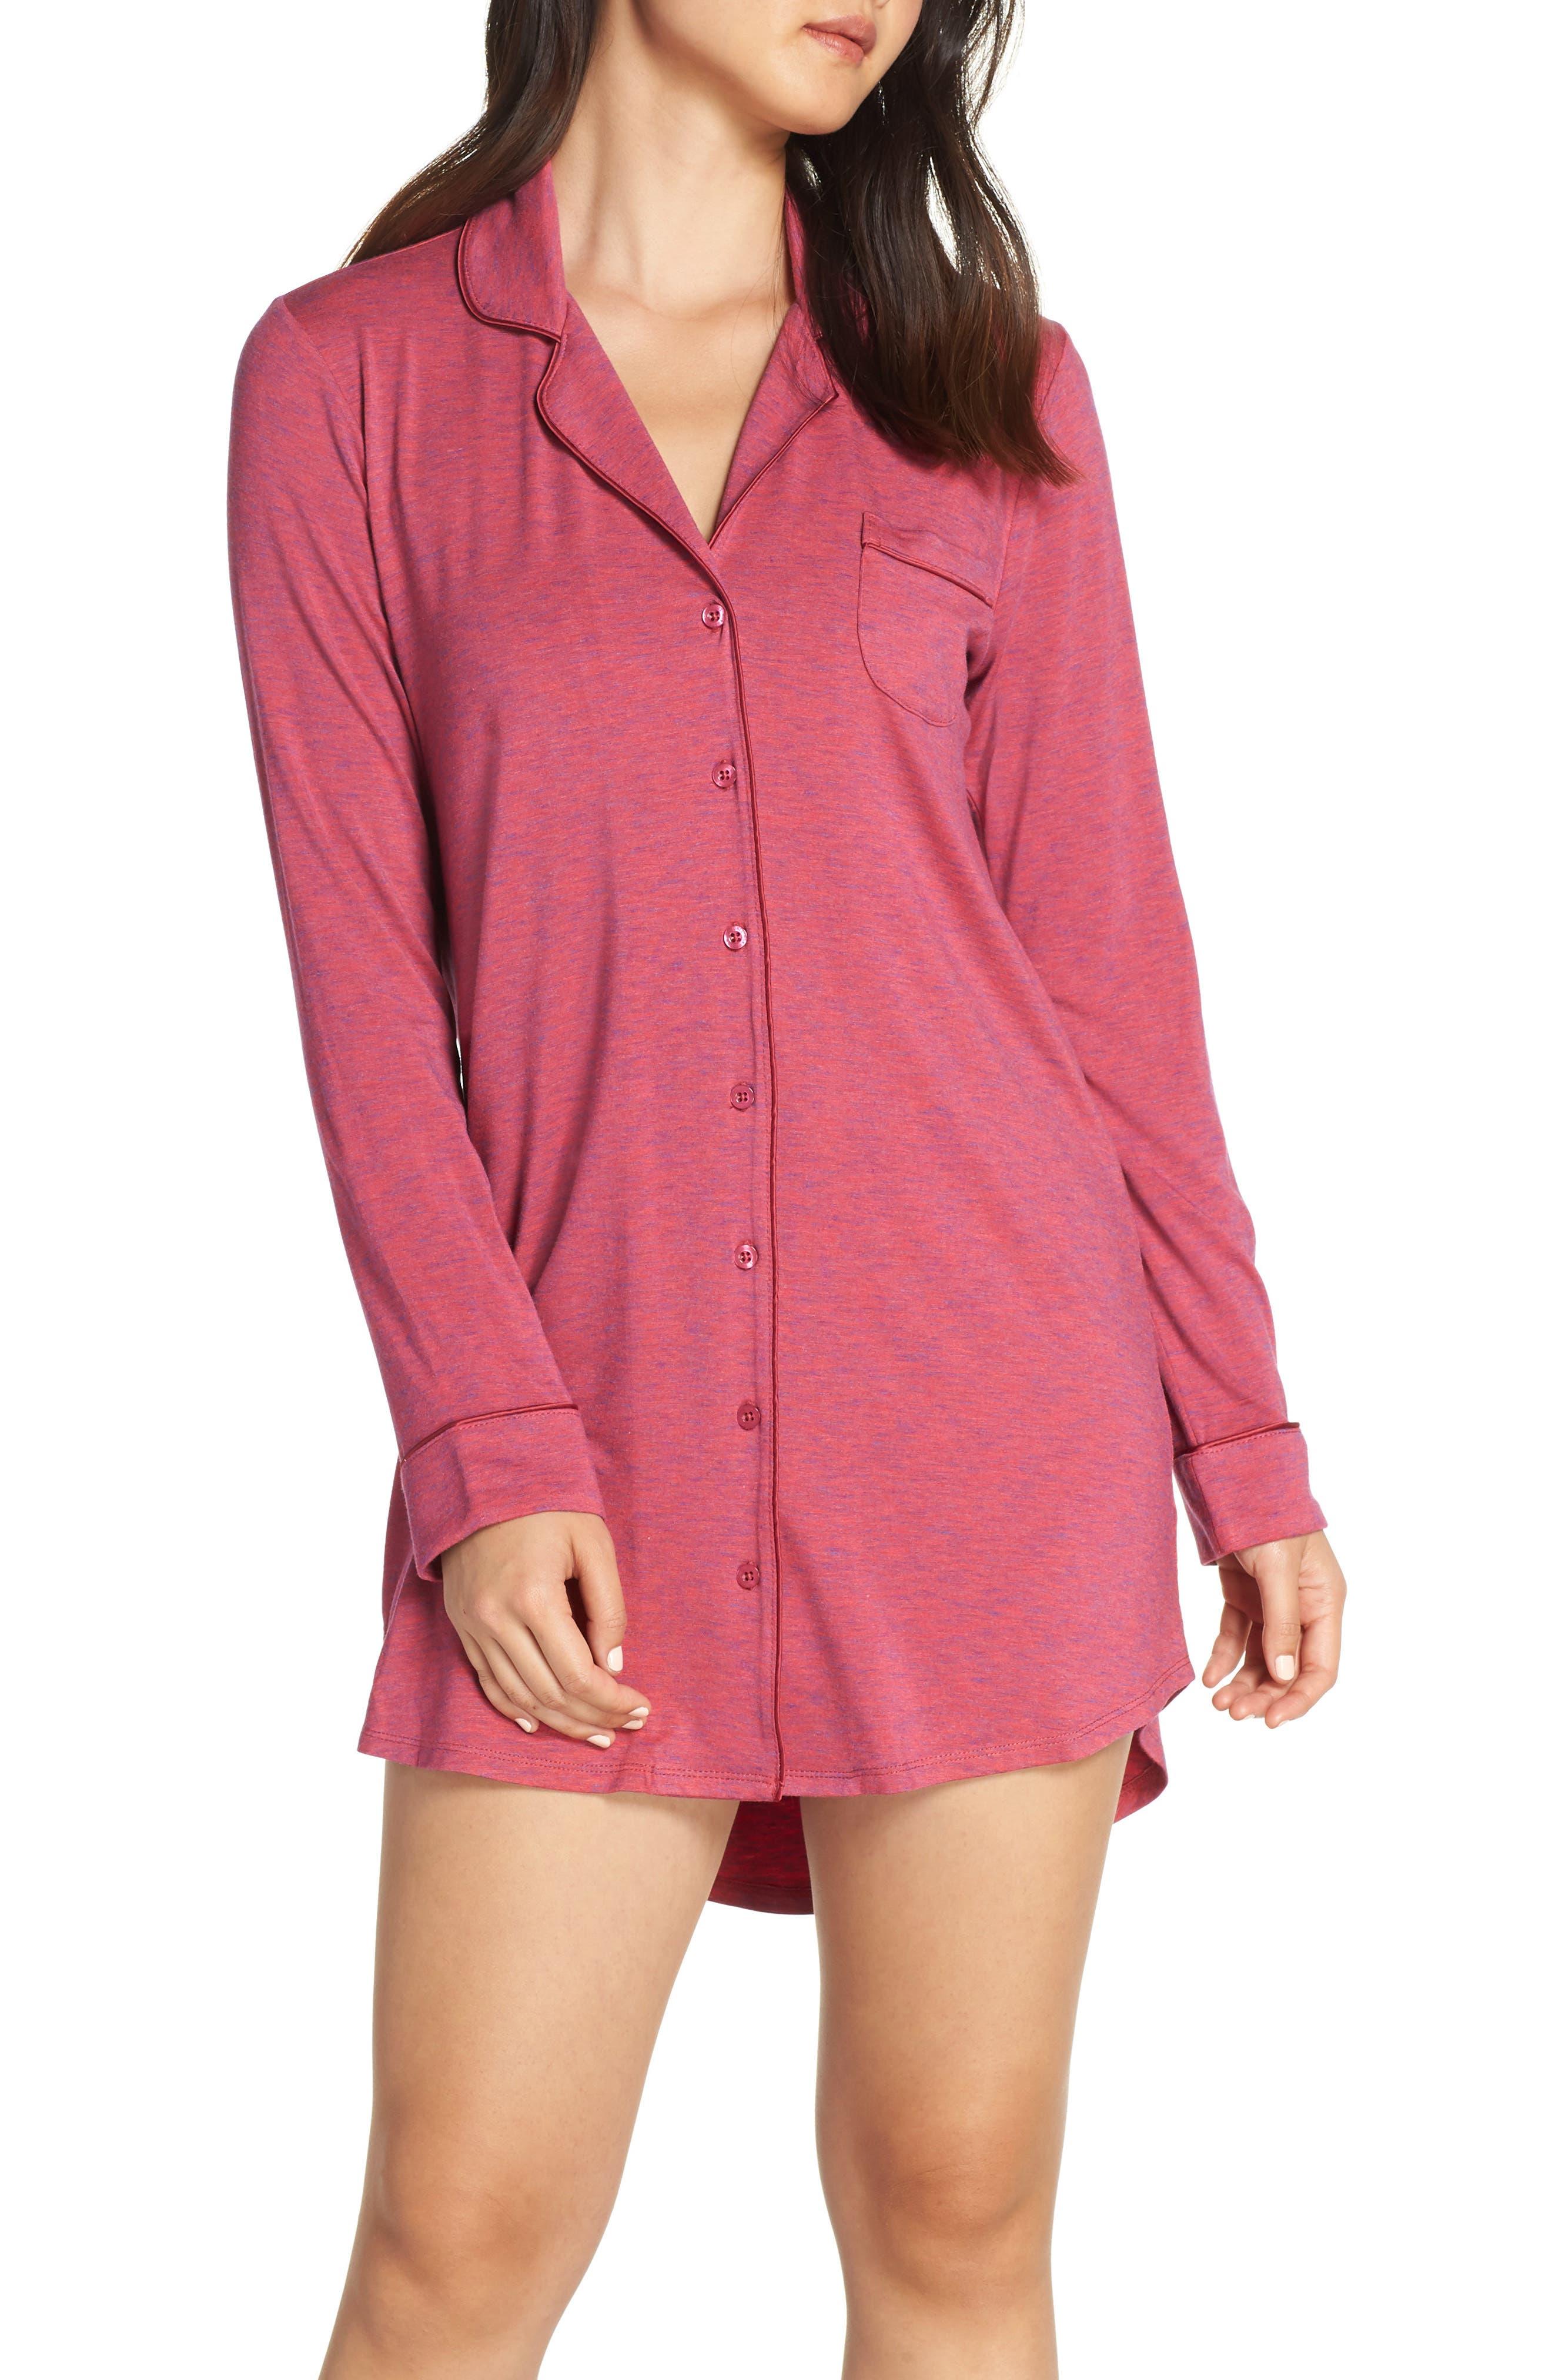 Cute Summer Sleepwear